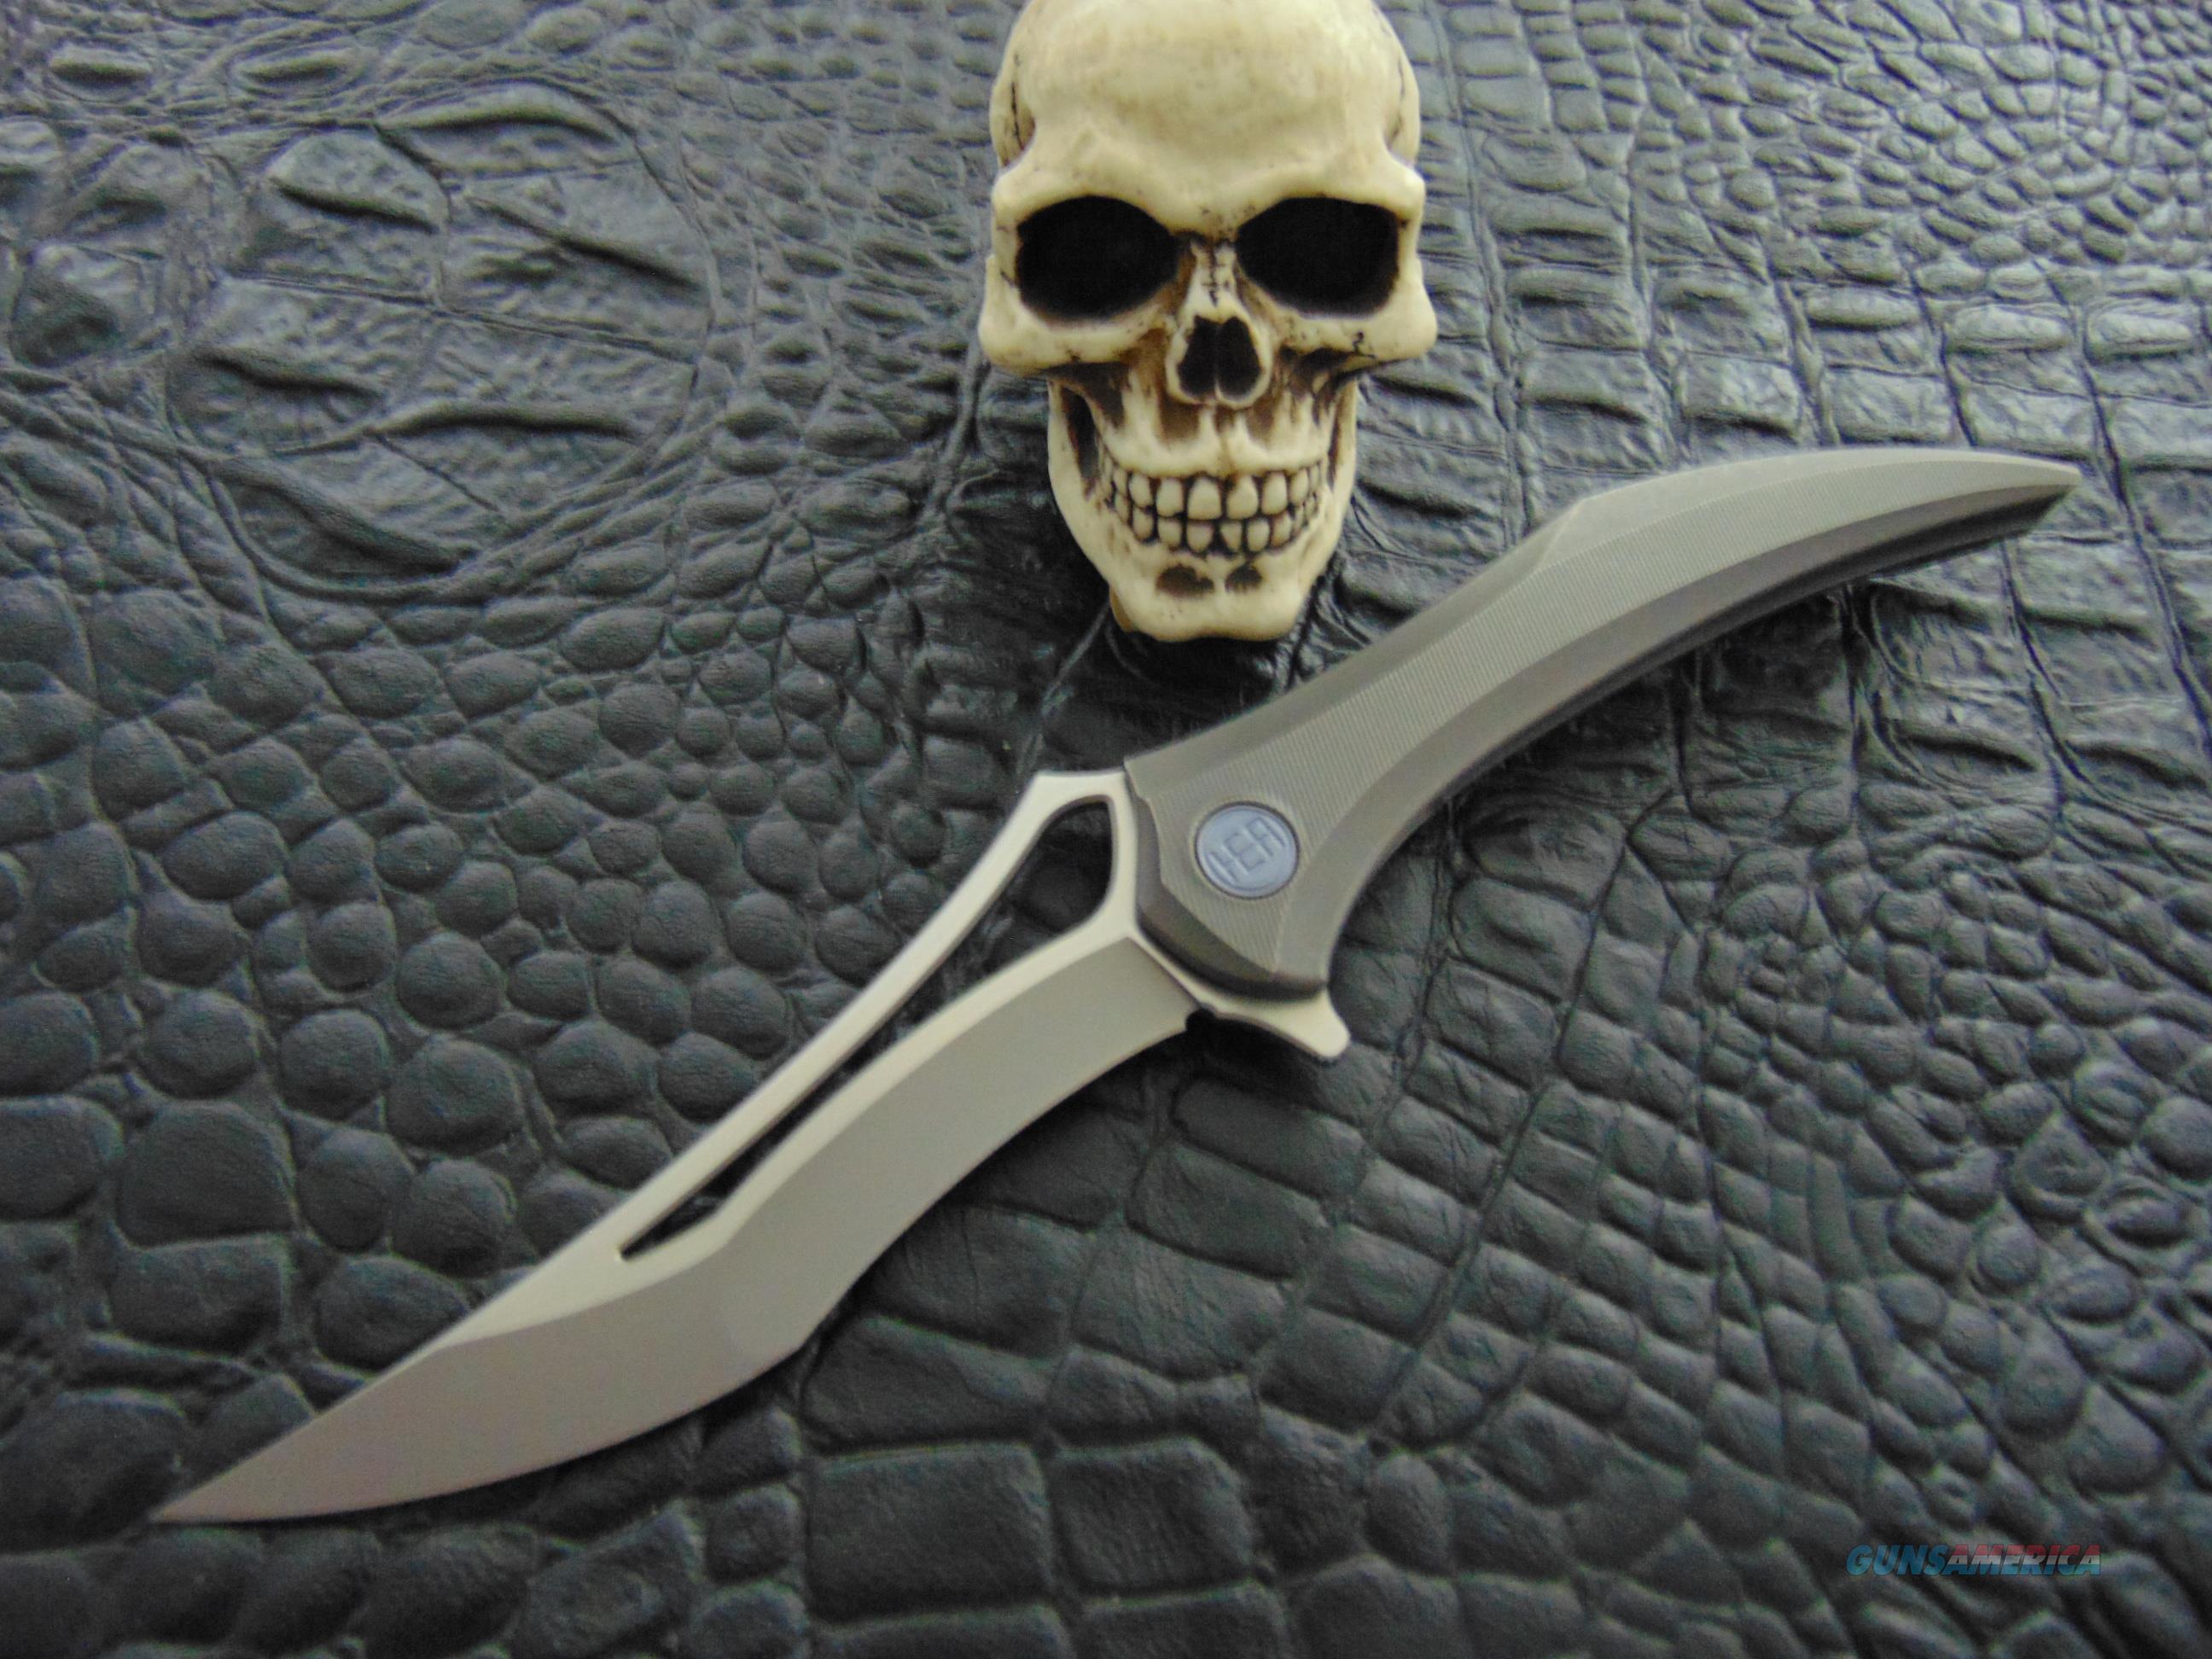 HEAdesigns }} Flame {{ INTEGRAL Frame Lock Flipper Grey  Non-Guns > Knives/Swords > Knives > Folding Blade > Hand Made